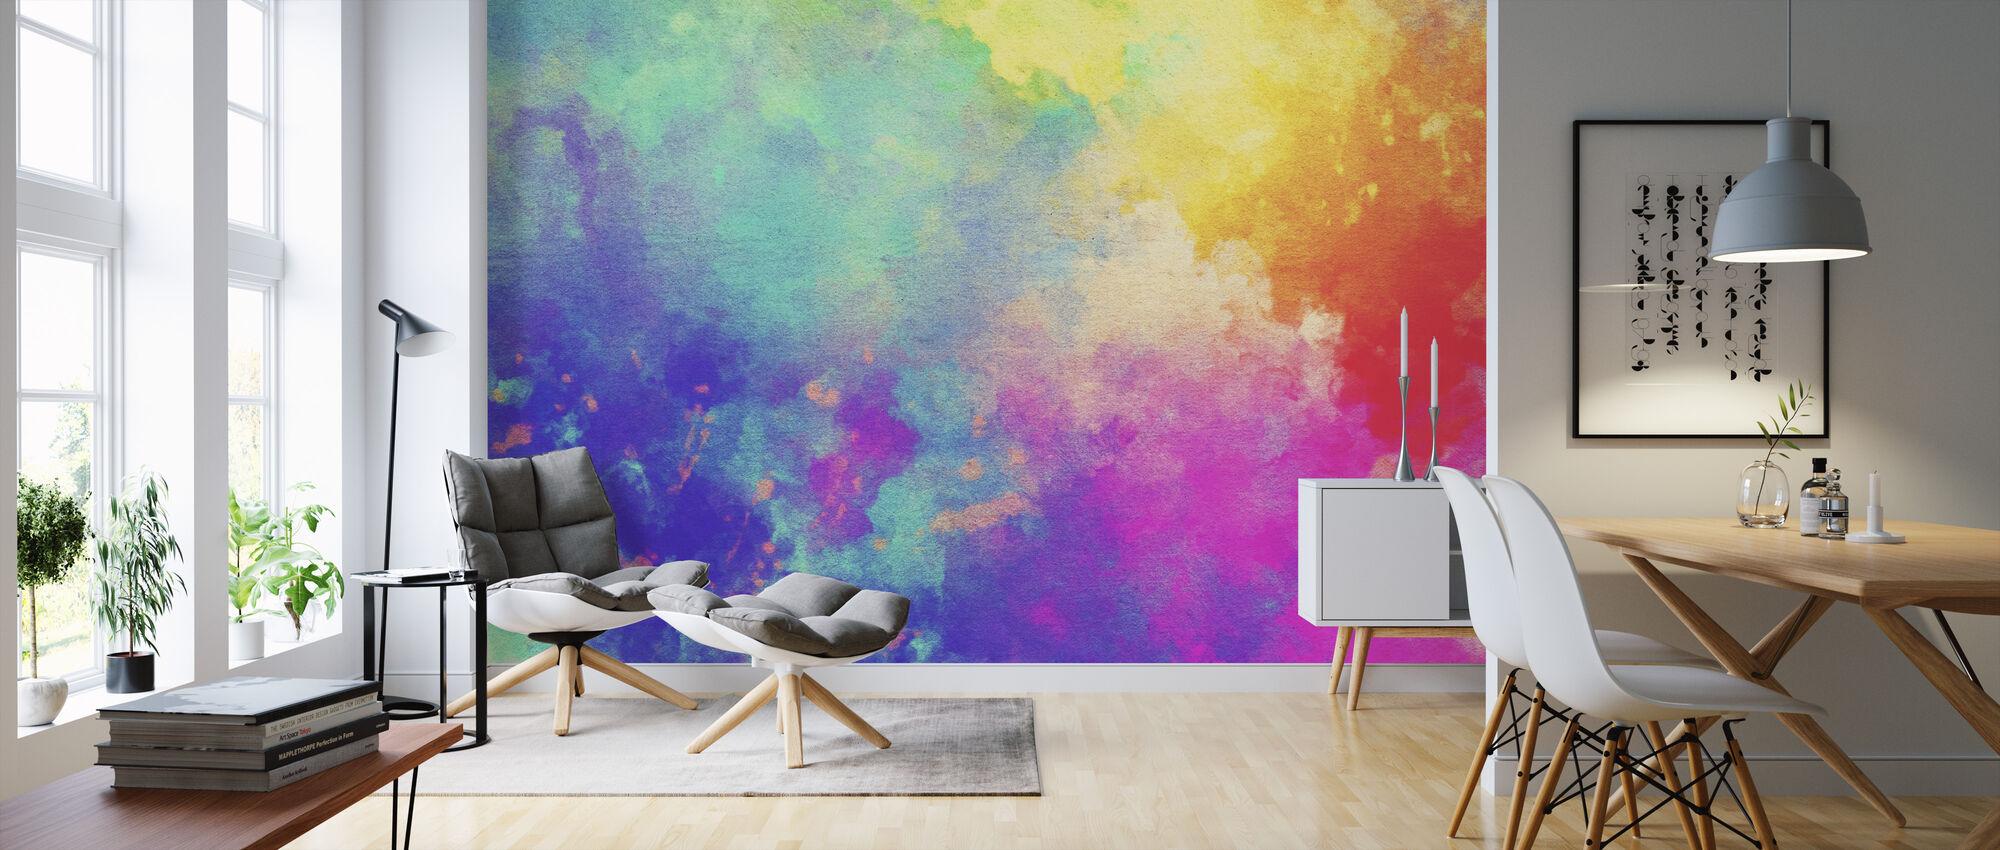 Watercolor Textured Background - Wallpaper - Living Room